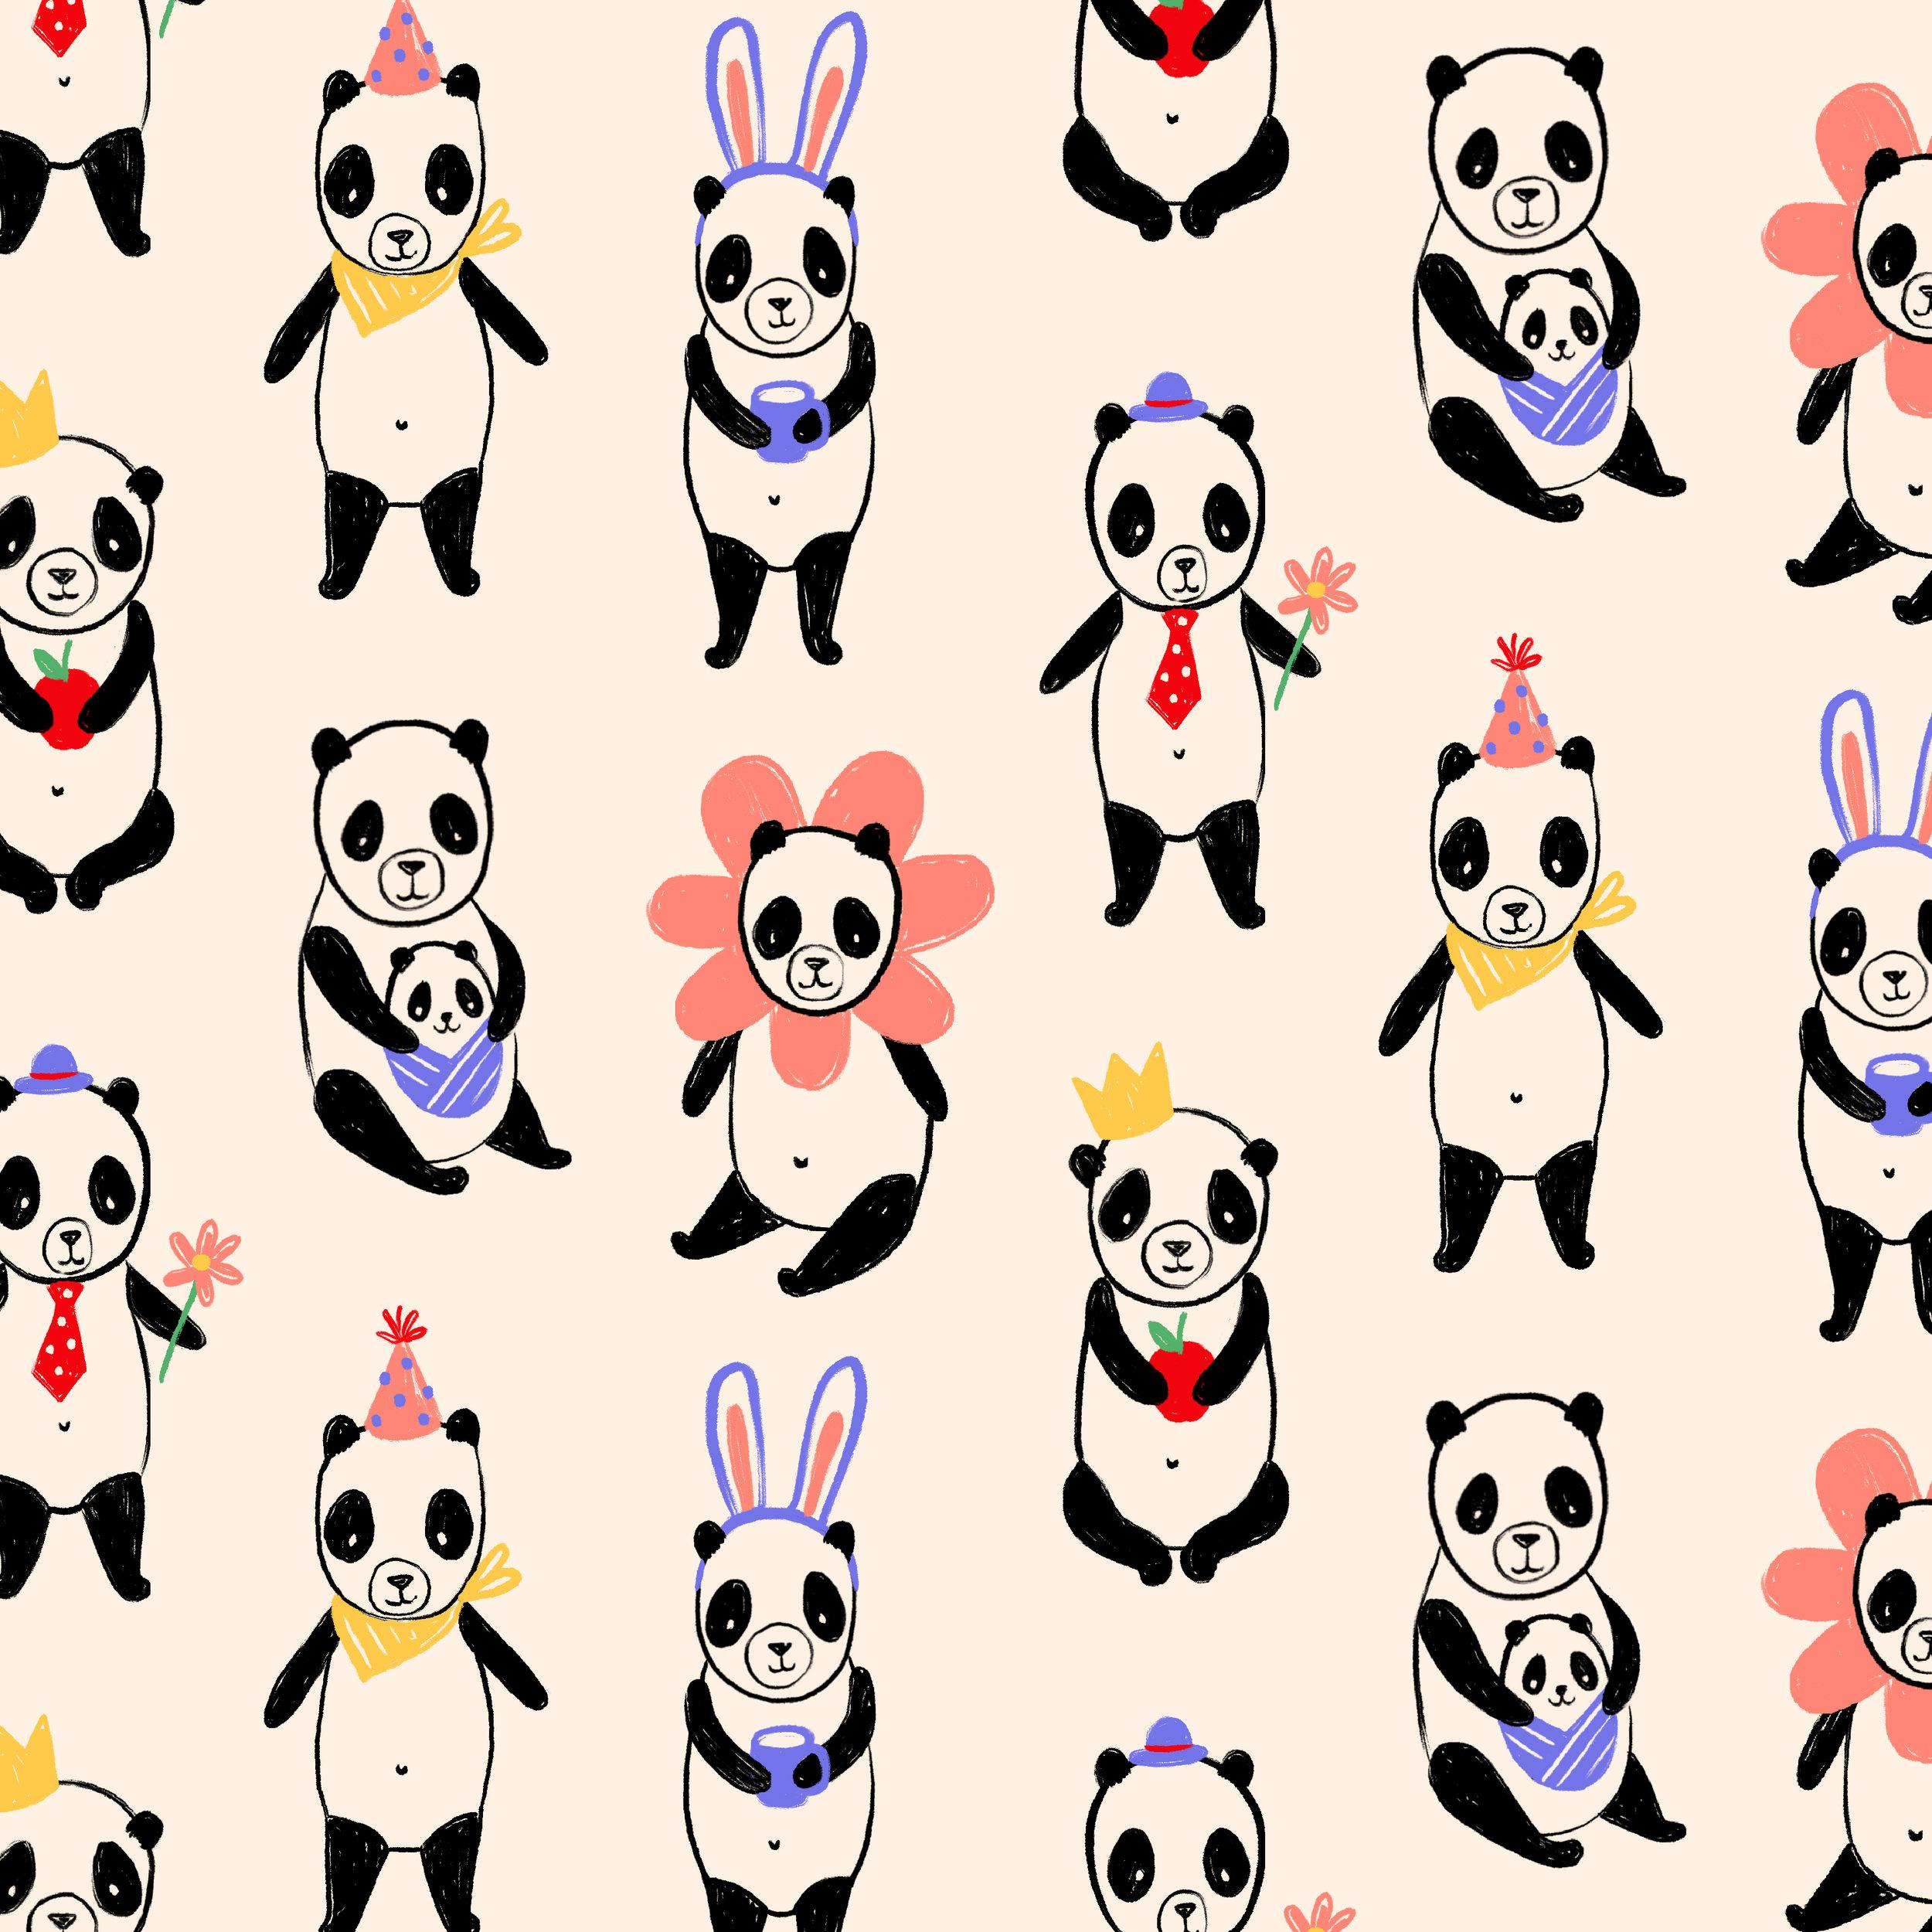 Dressed_Pandas Allover.jpg